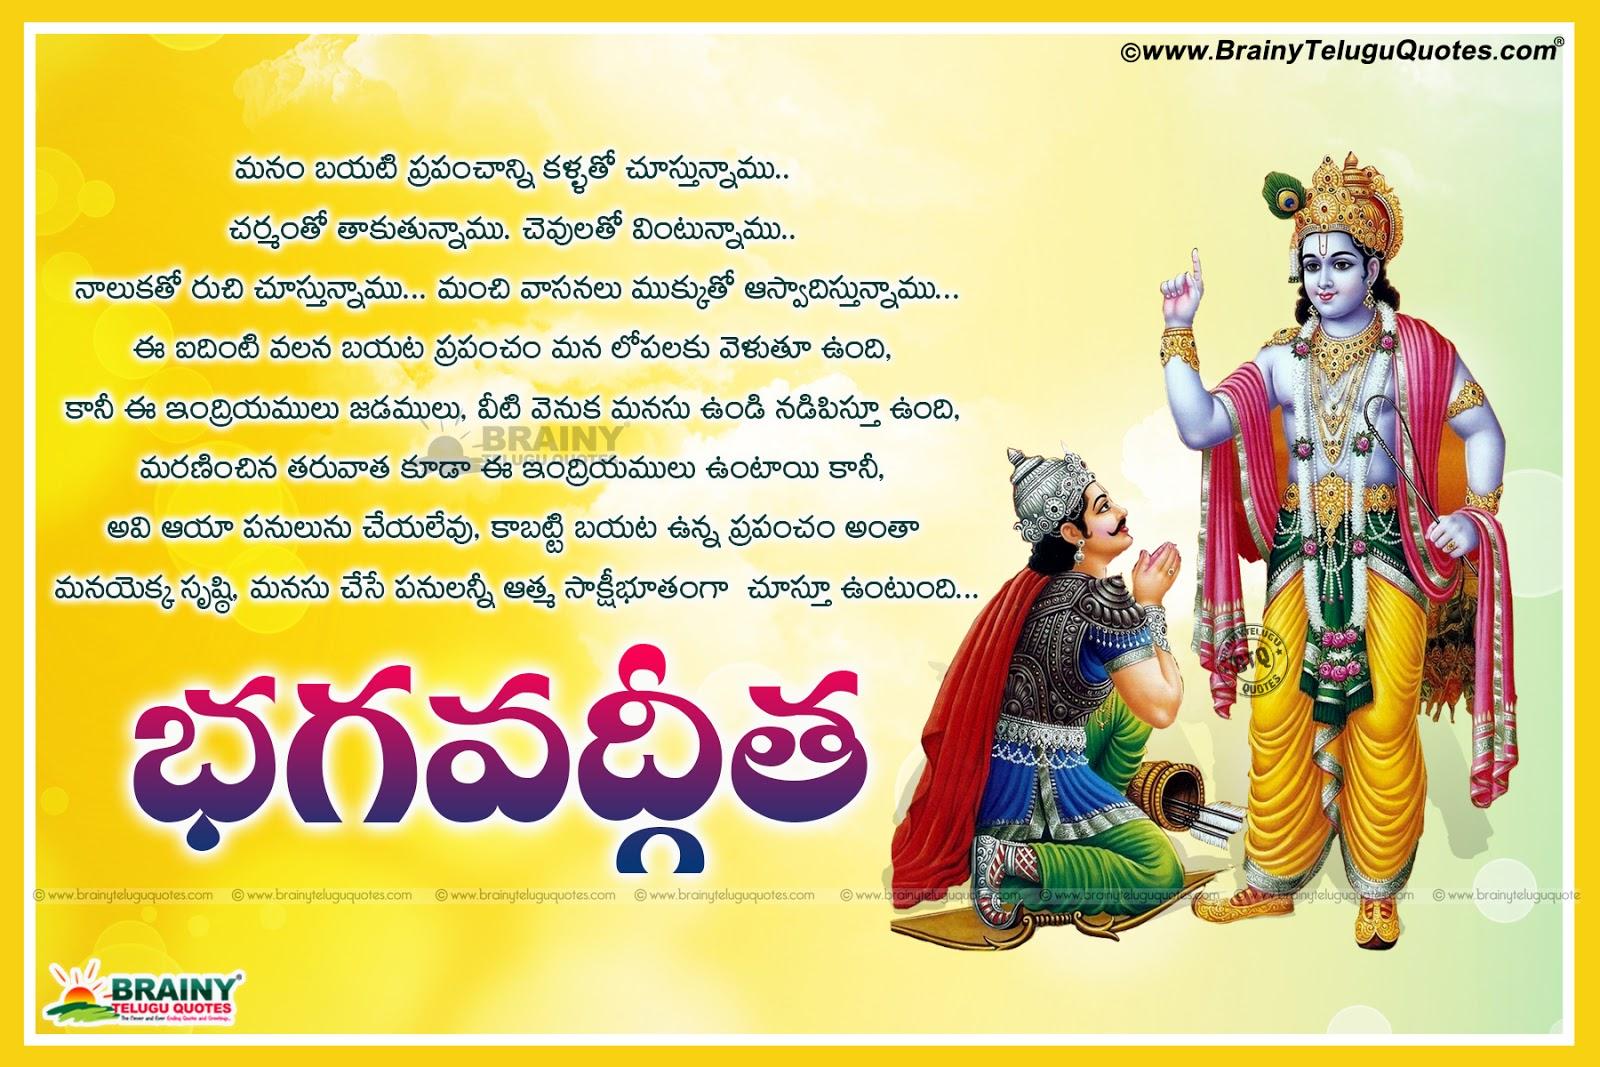 Bhagavad Gita Lyrics Pdf Free Download Bhagavad Gita Telugu Pdf Jnana Kadali Com Telugu Quotes English Quotes Hindi Quotes Tamil Quotes Dharmasandehalu